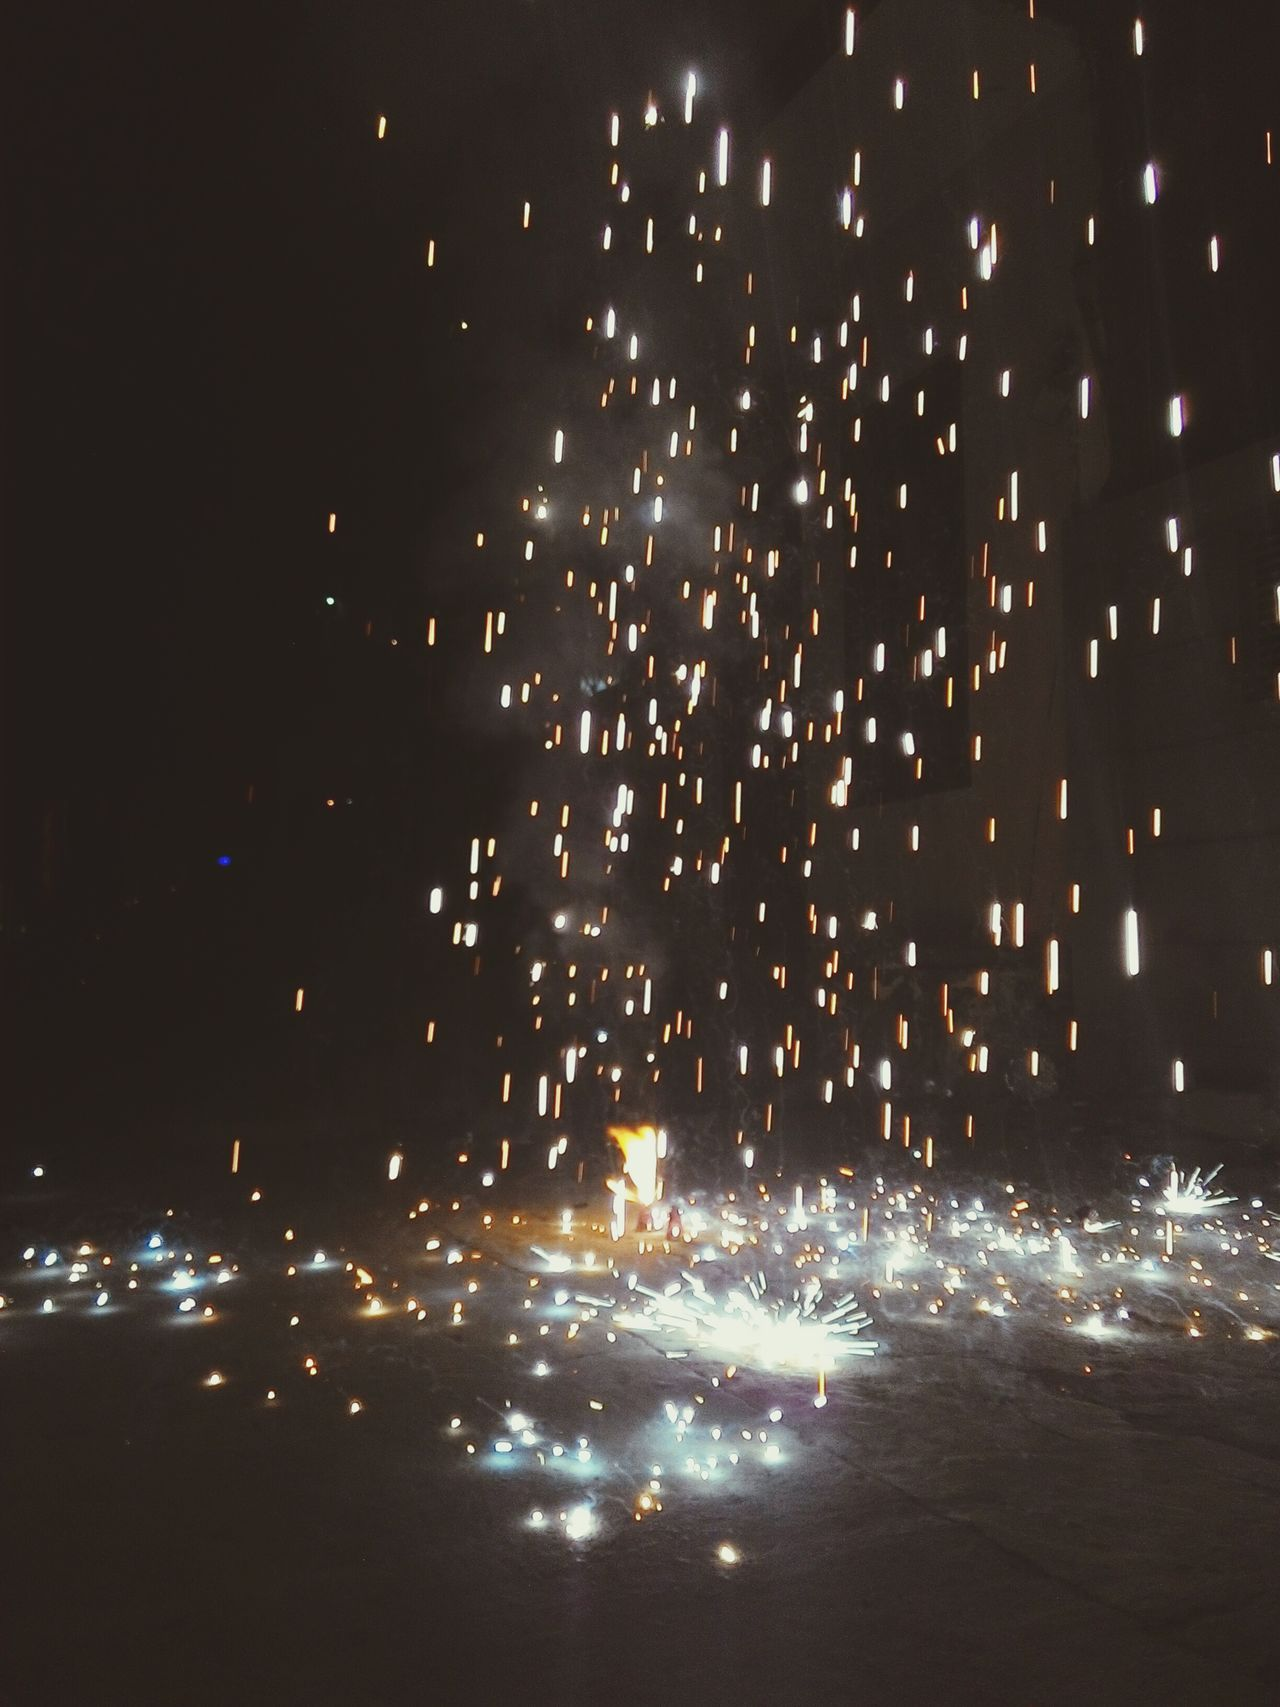 Diwali Diwali2014 Crackers Fireworks